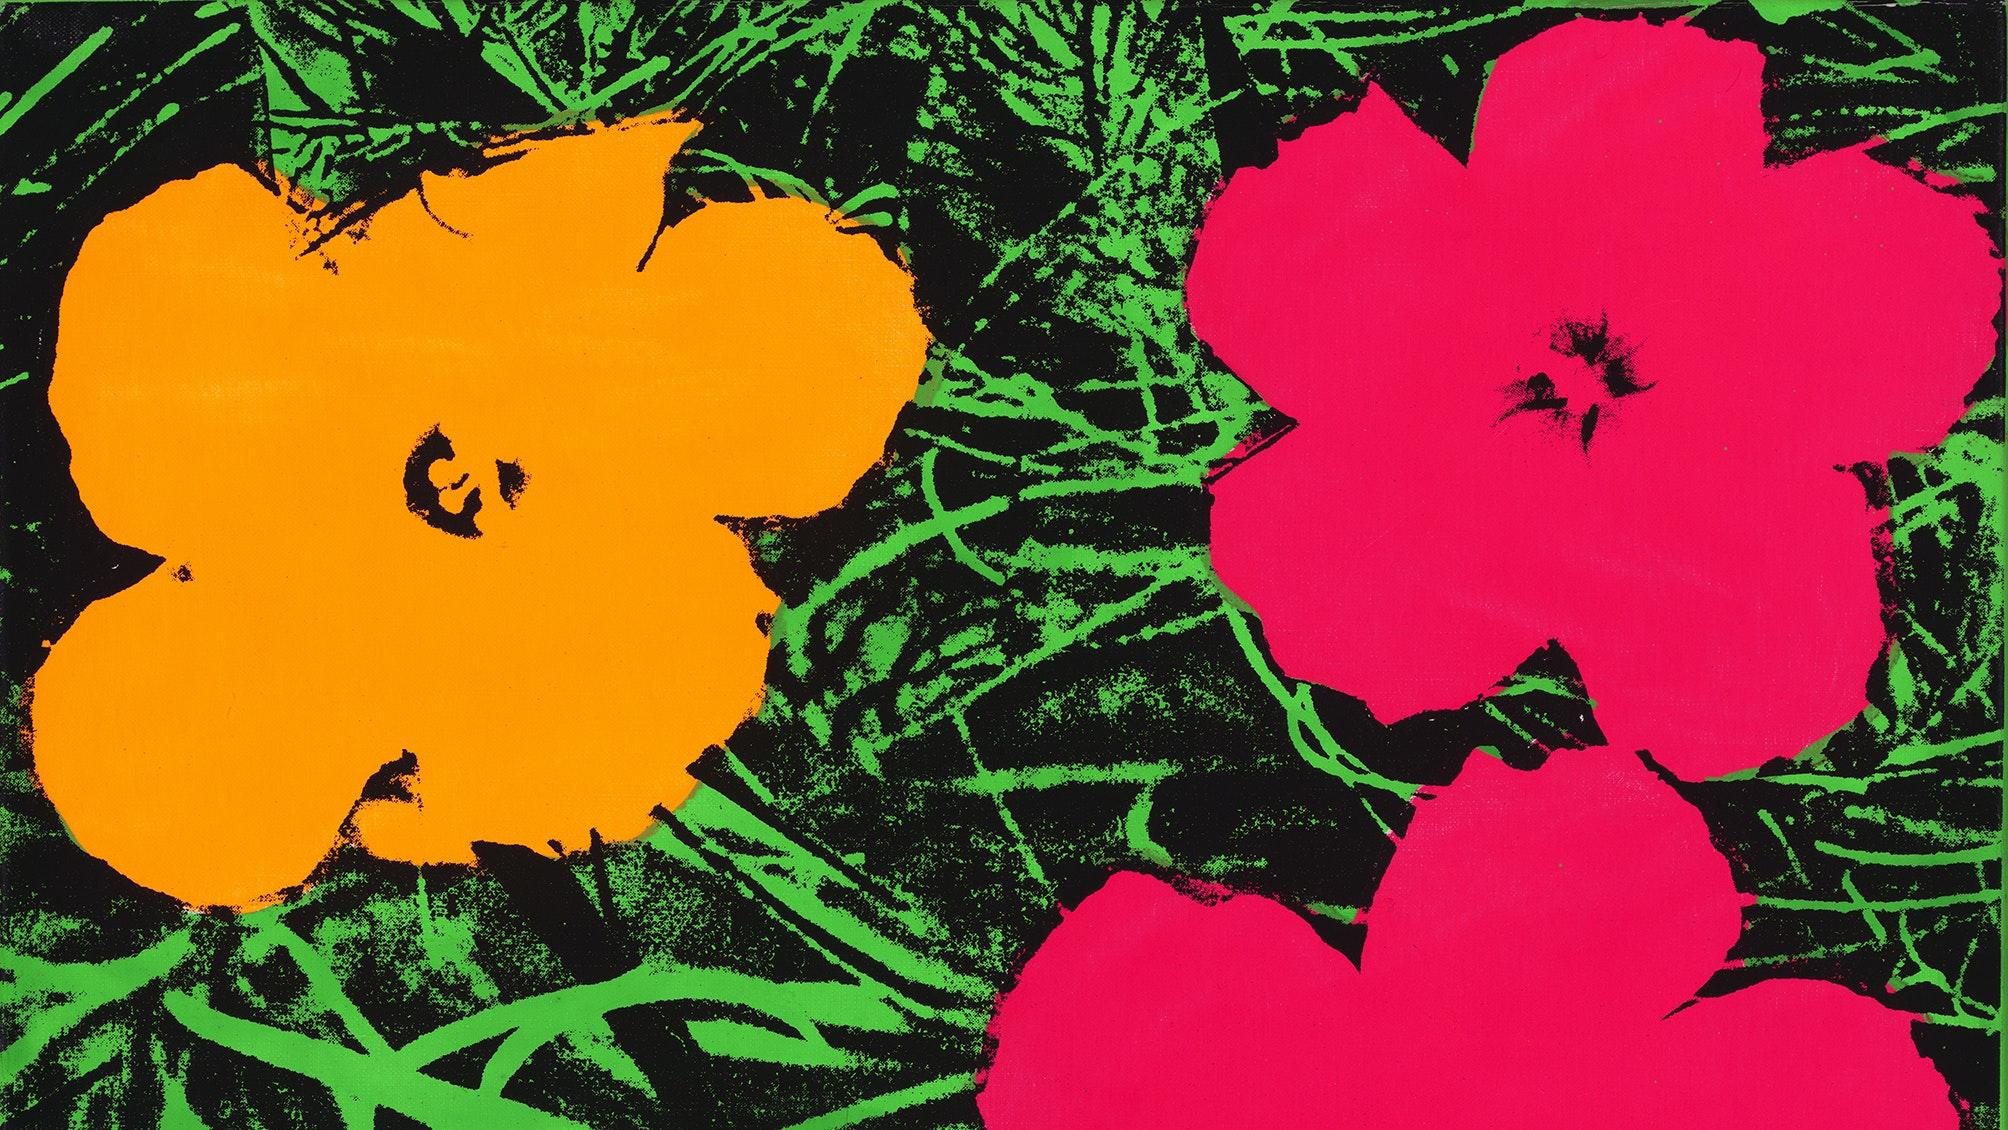 Andy Warhol Flowers 1964